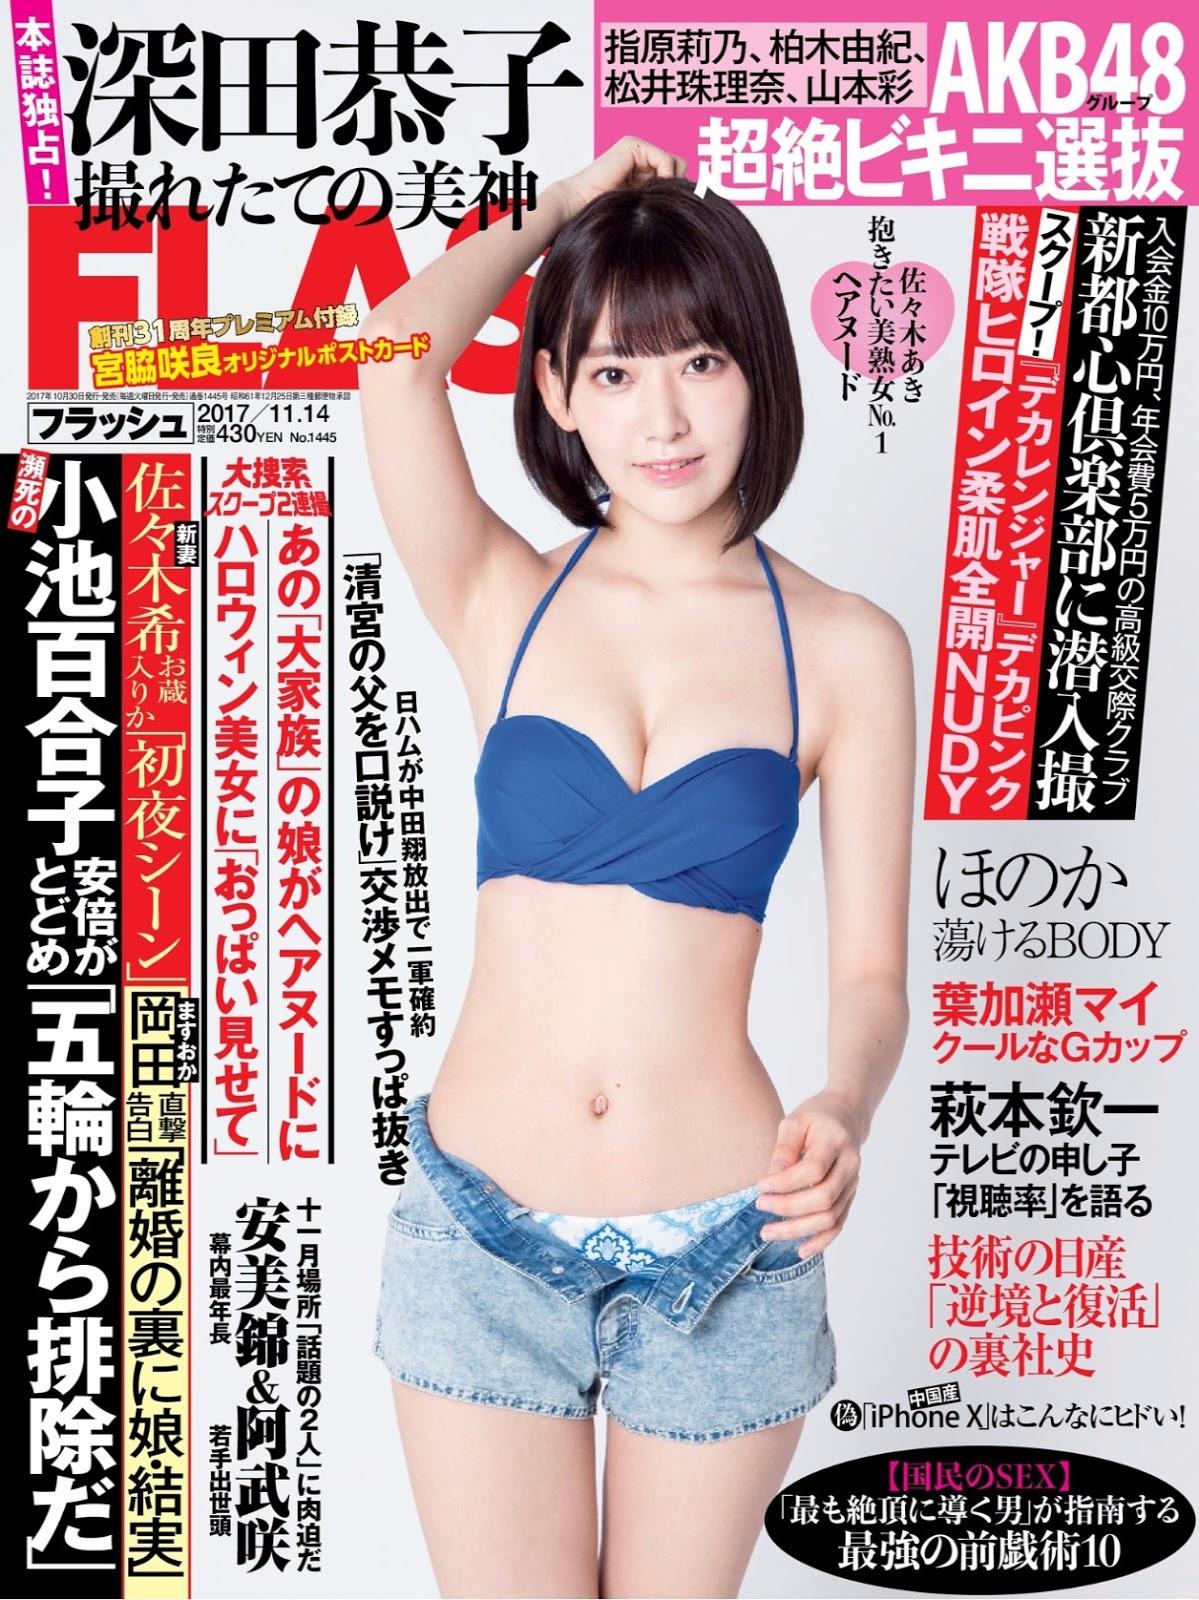 AKB48, FLASH 電子版 2017.11.14 (フラッシュ 2017年11月14日号)